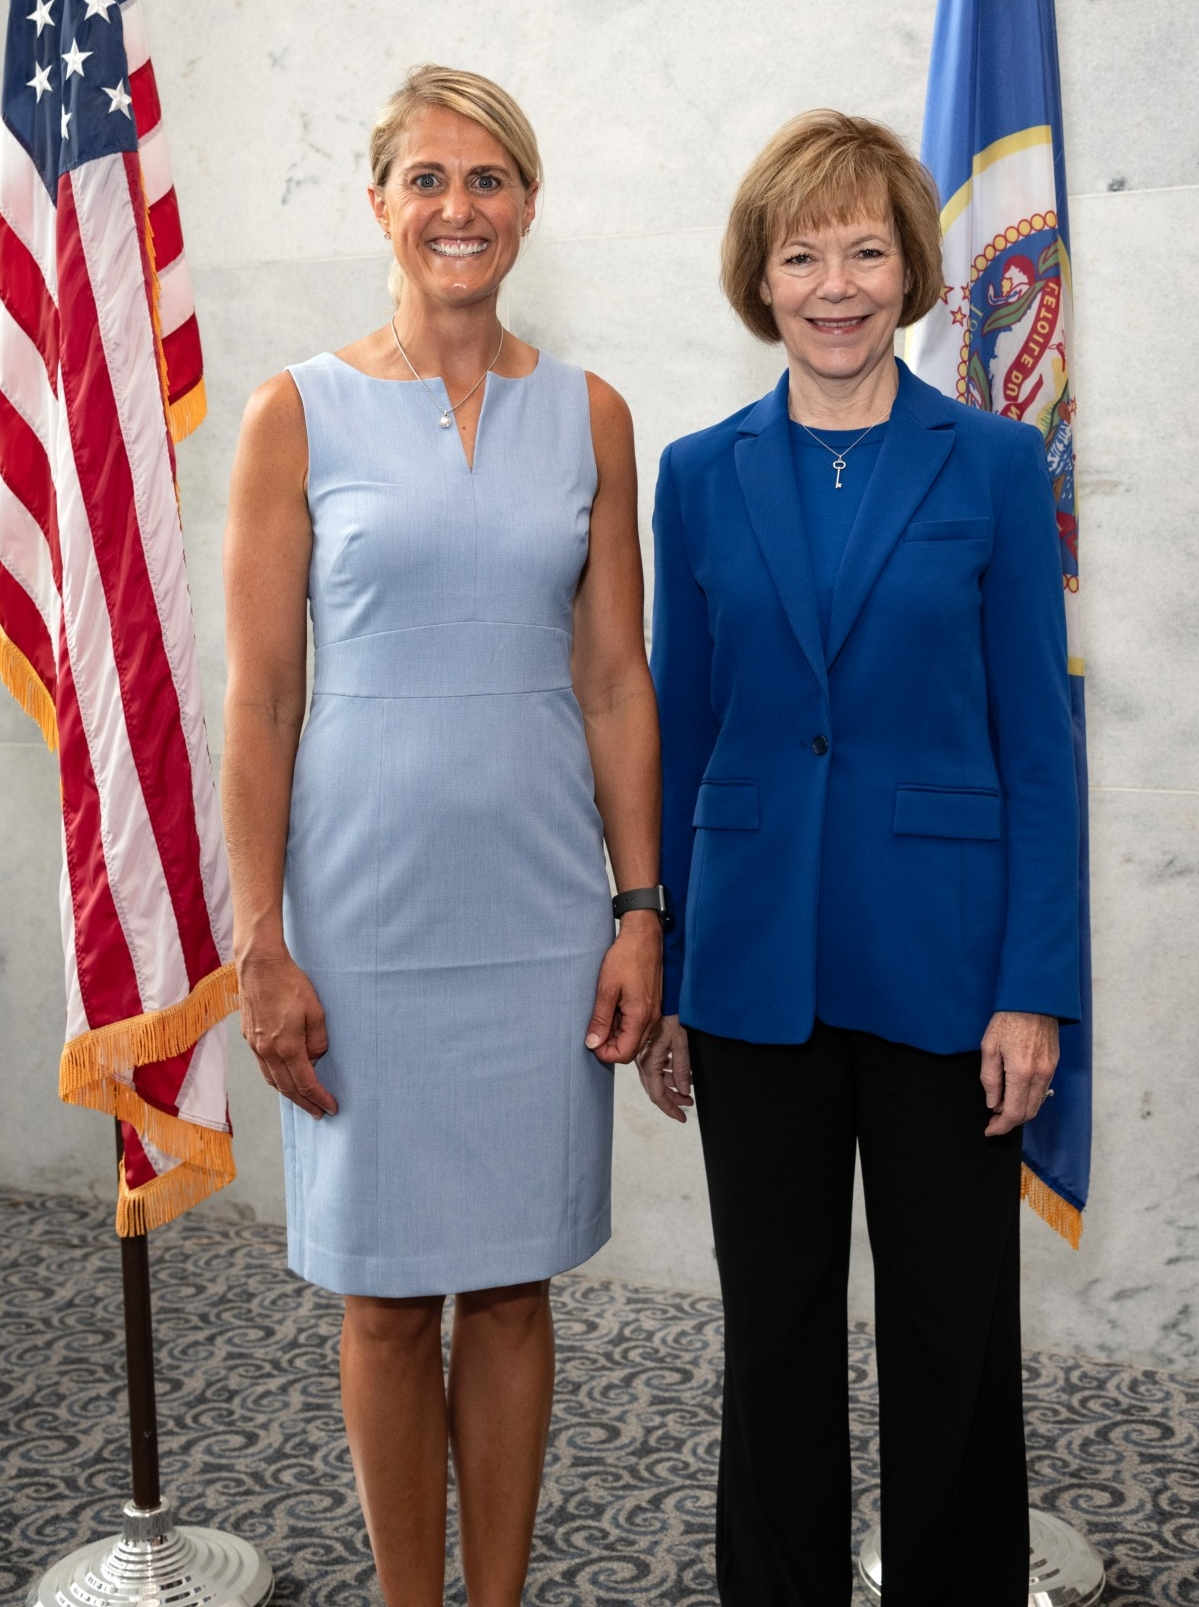 Jessica Ballin with Tina Smith, United States Senator from Minnesota